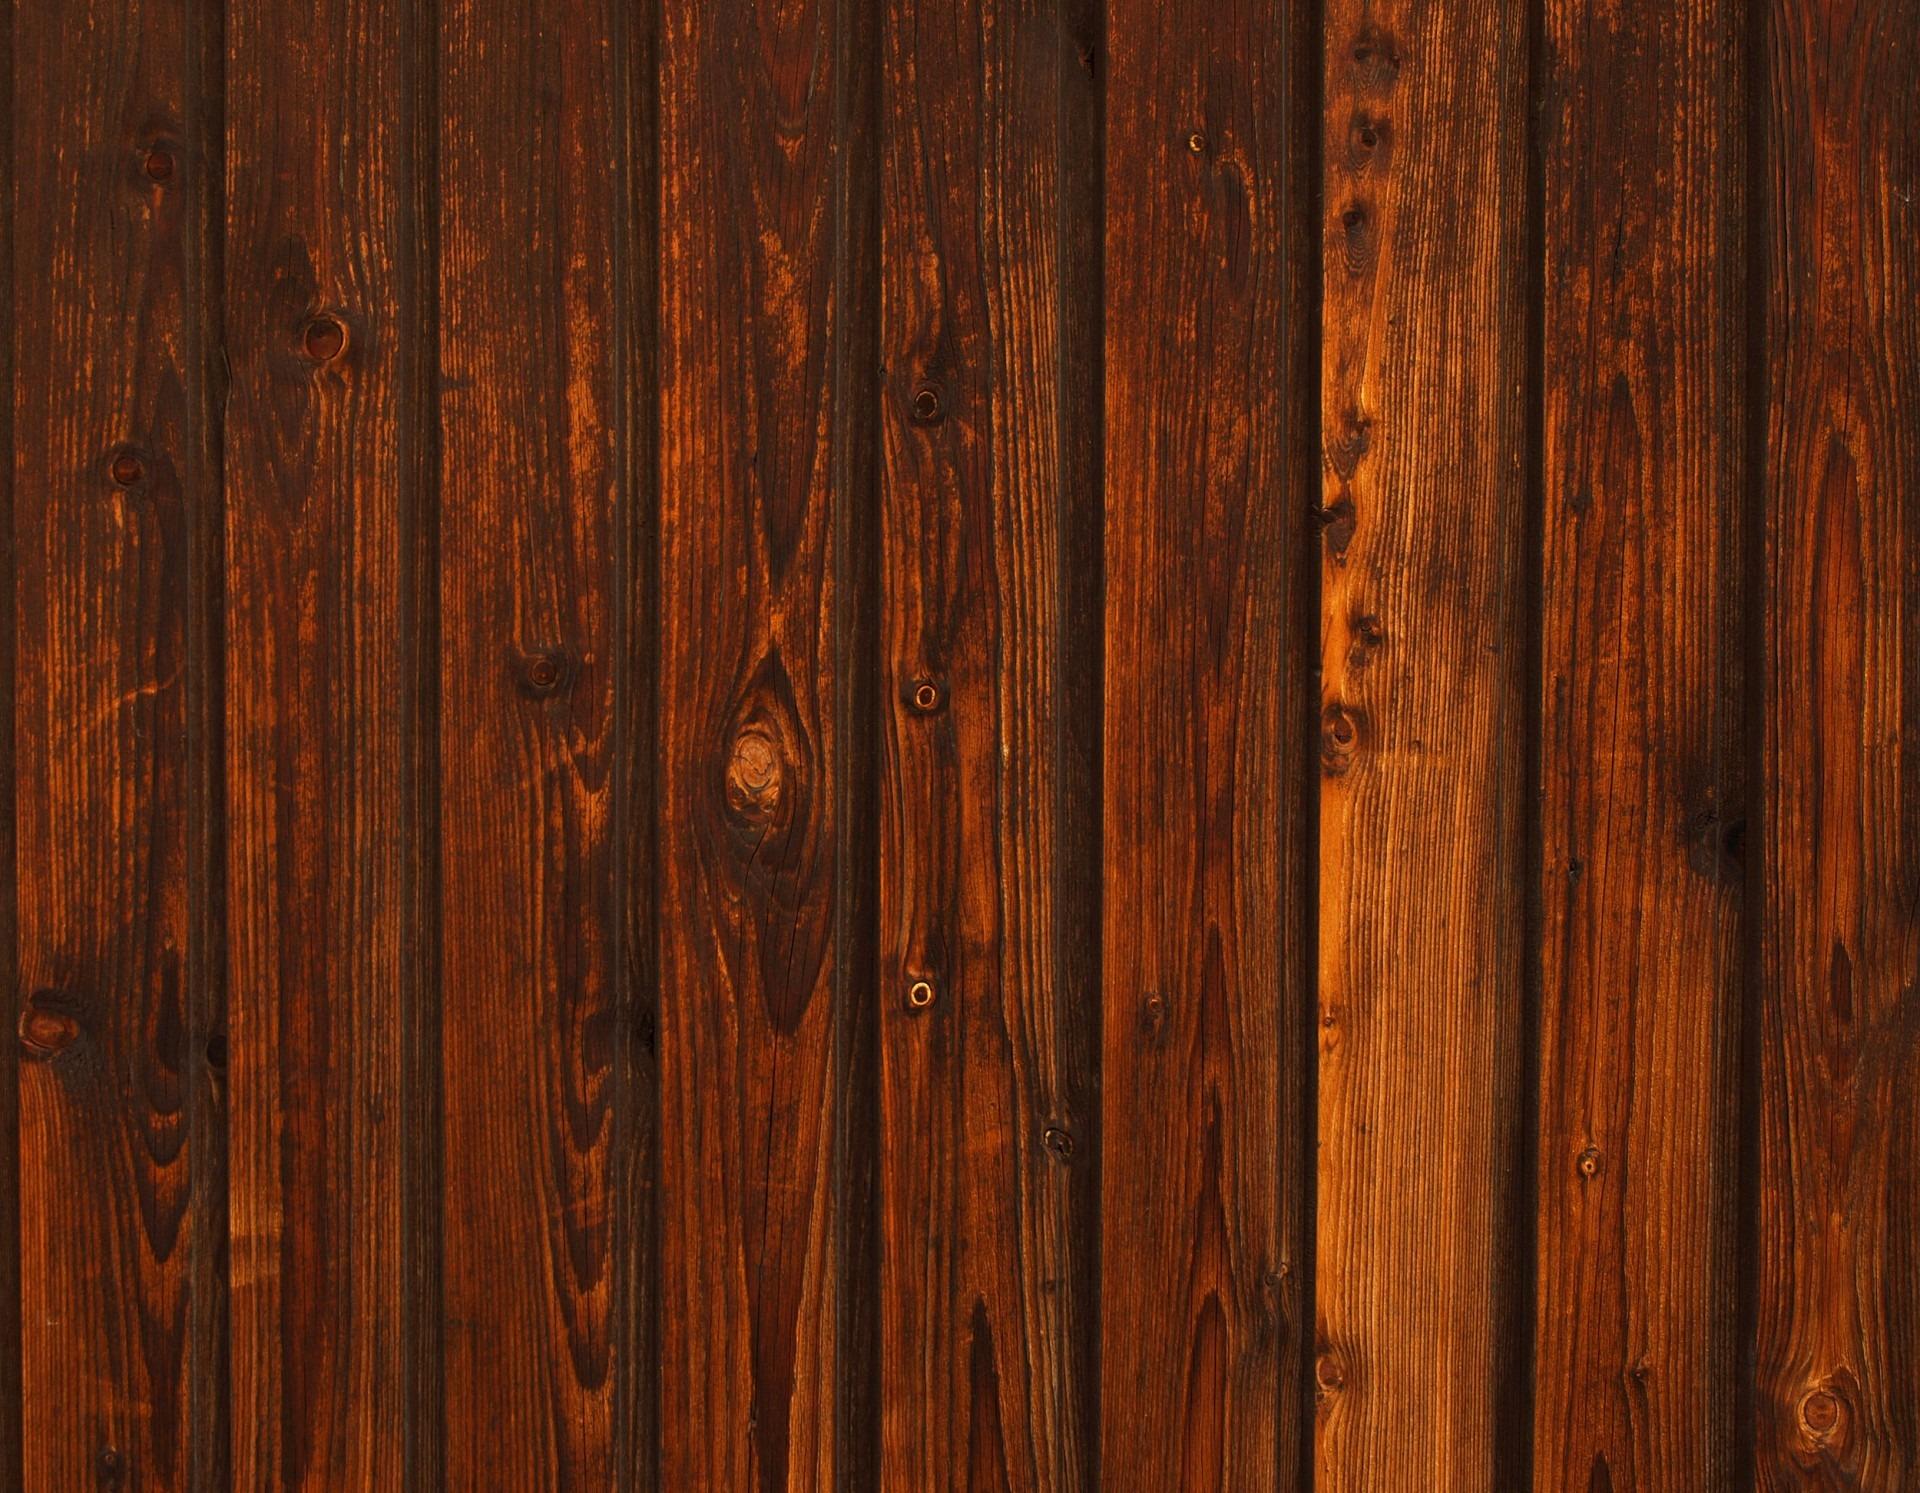 kostenlose foto zaun deck tafel holz boden textur planke stock muster braun t r. Black Bedroom Furniture Sets. Home Design Ideas